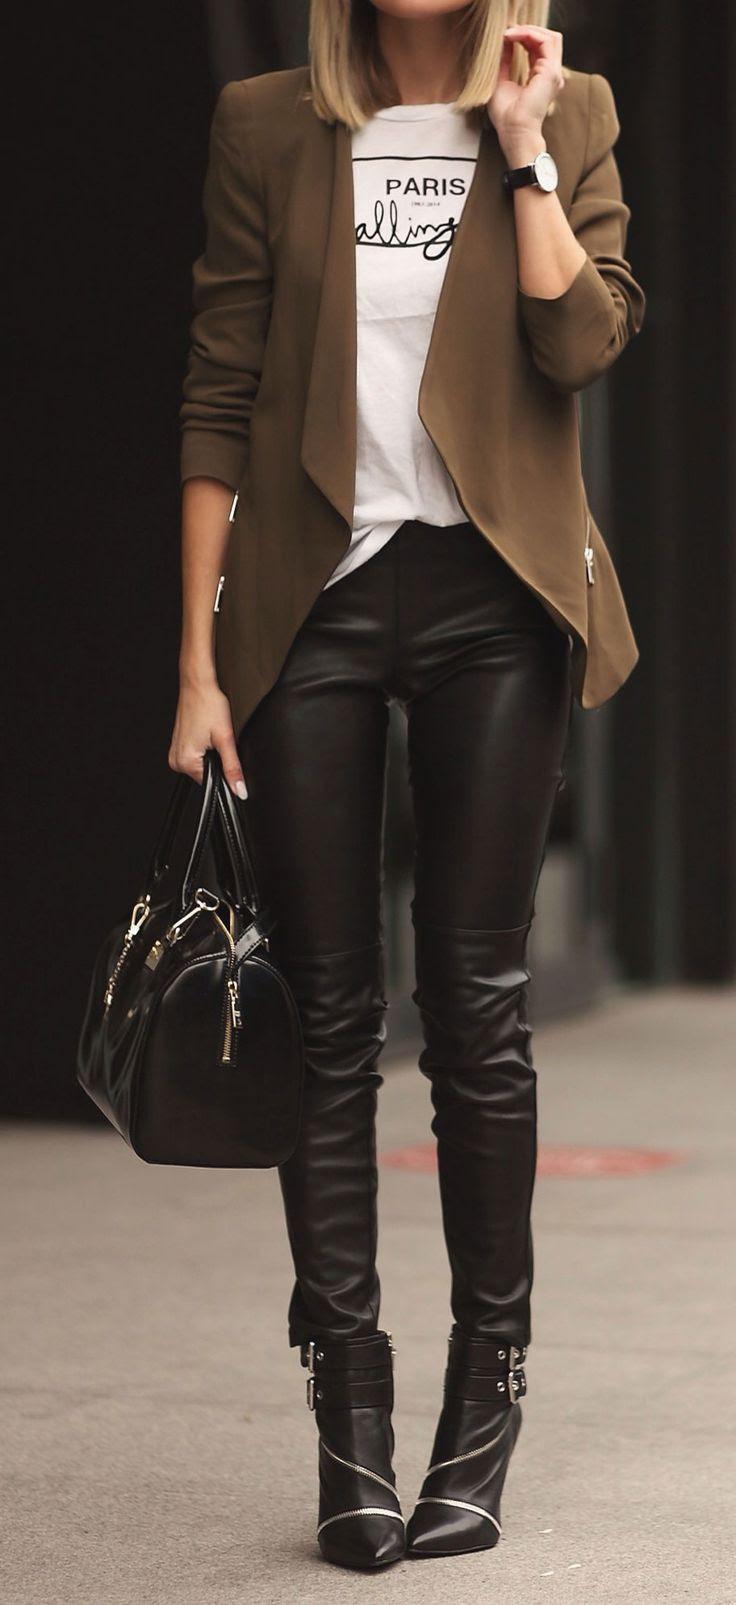 Taupe + black.